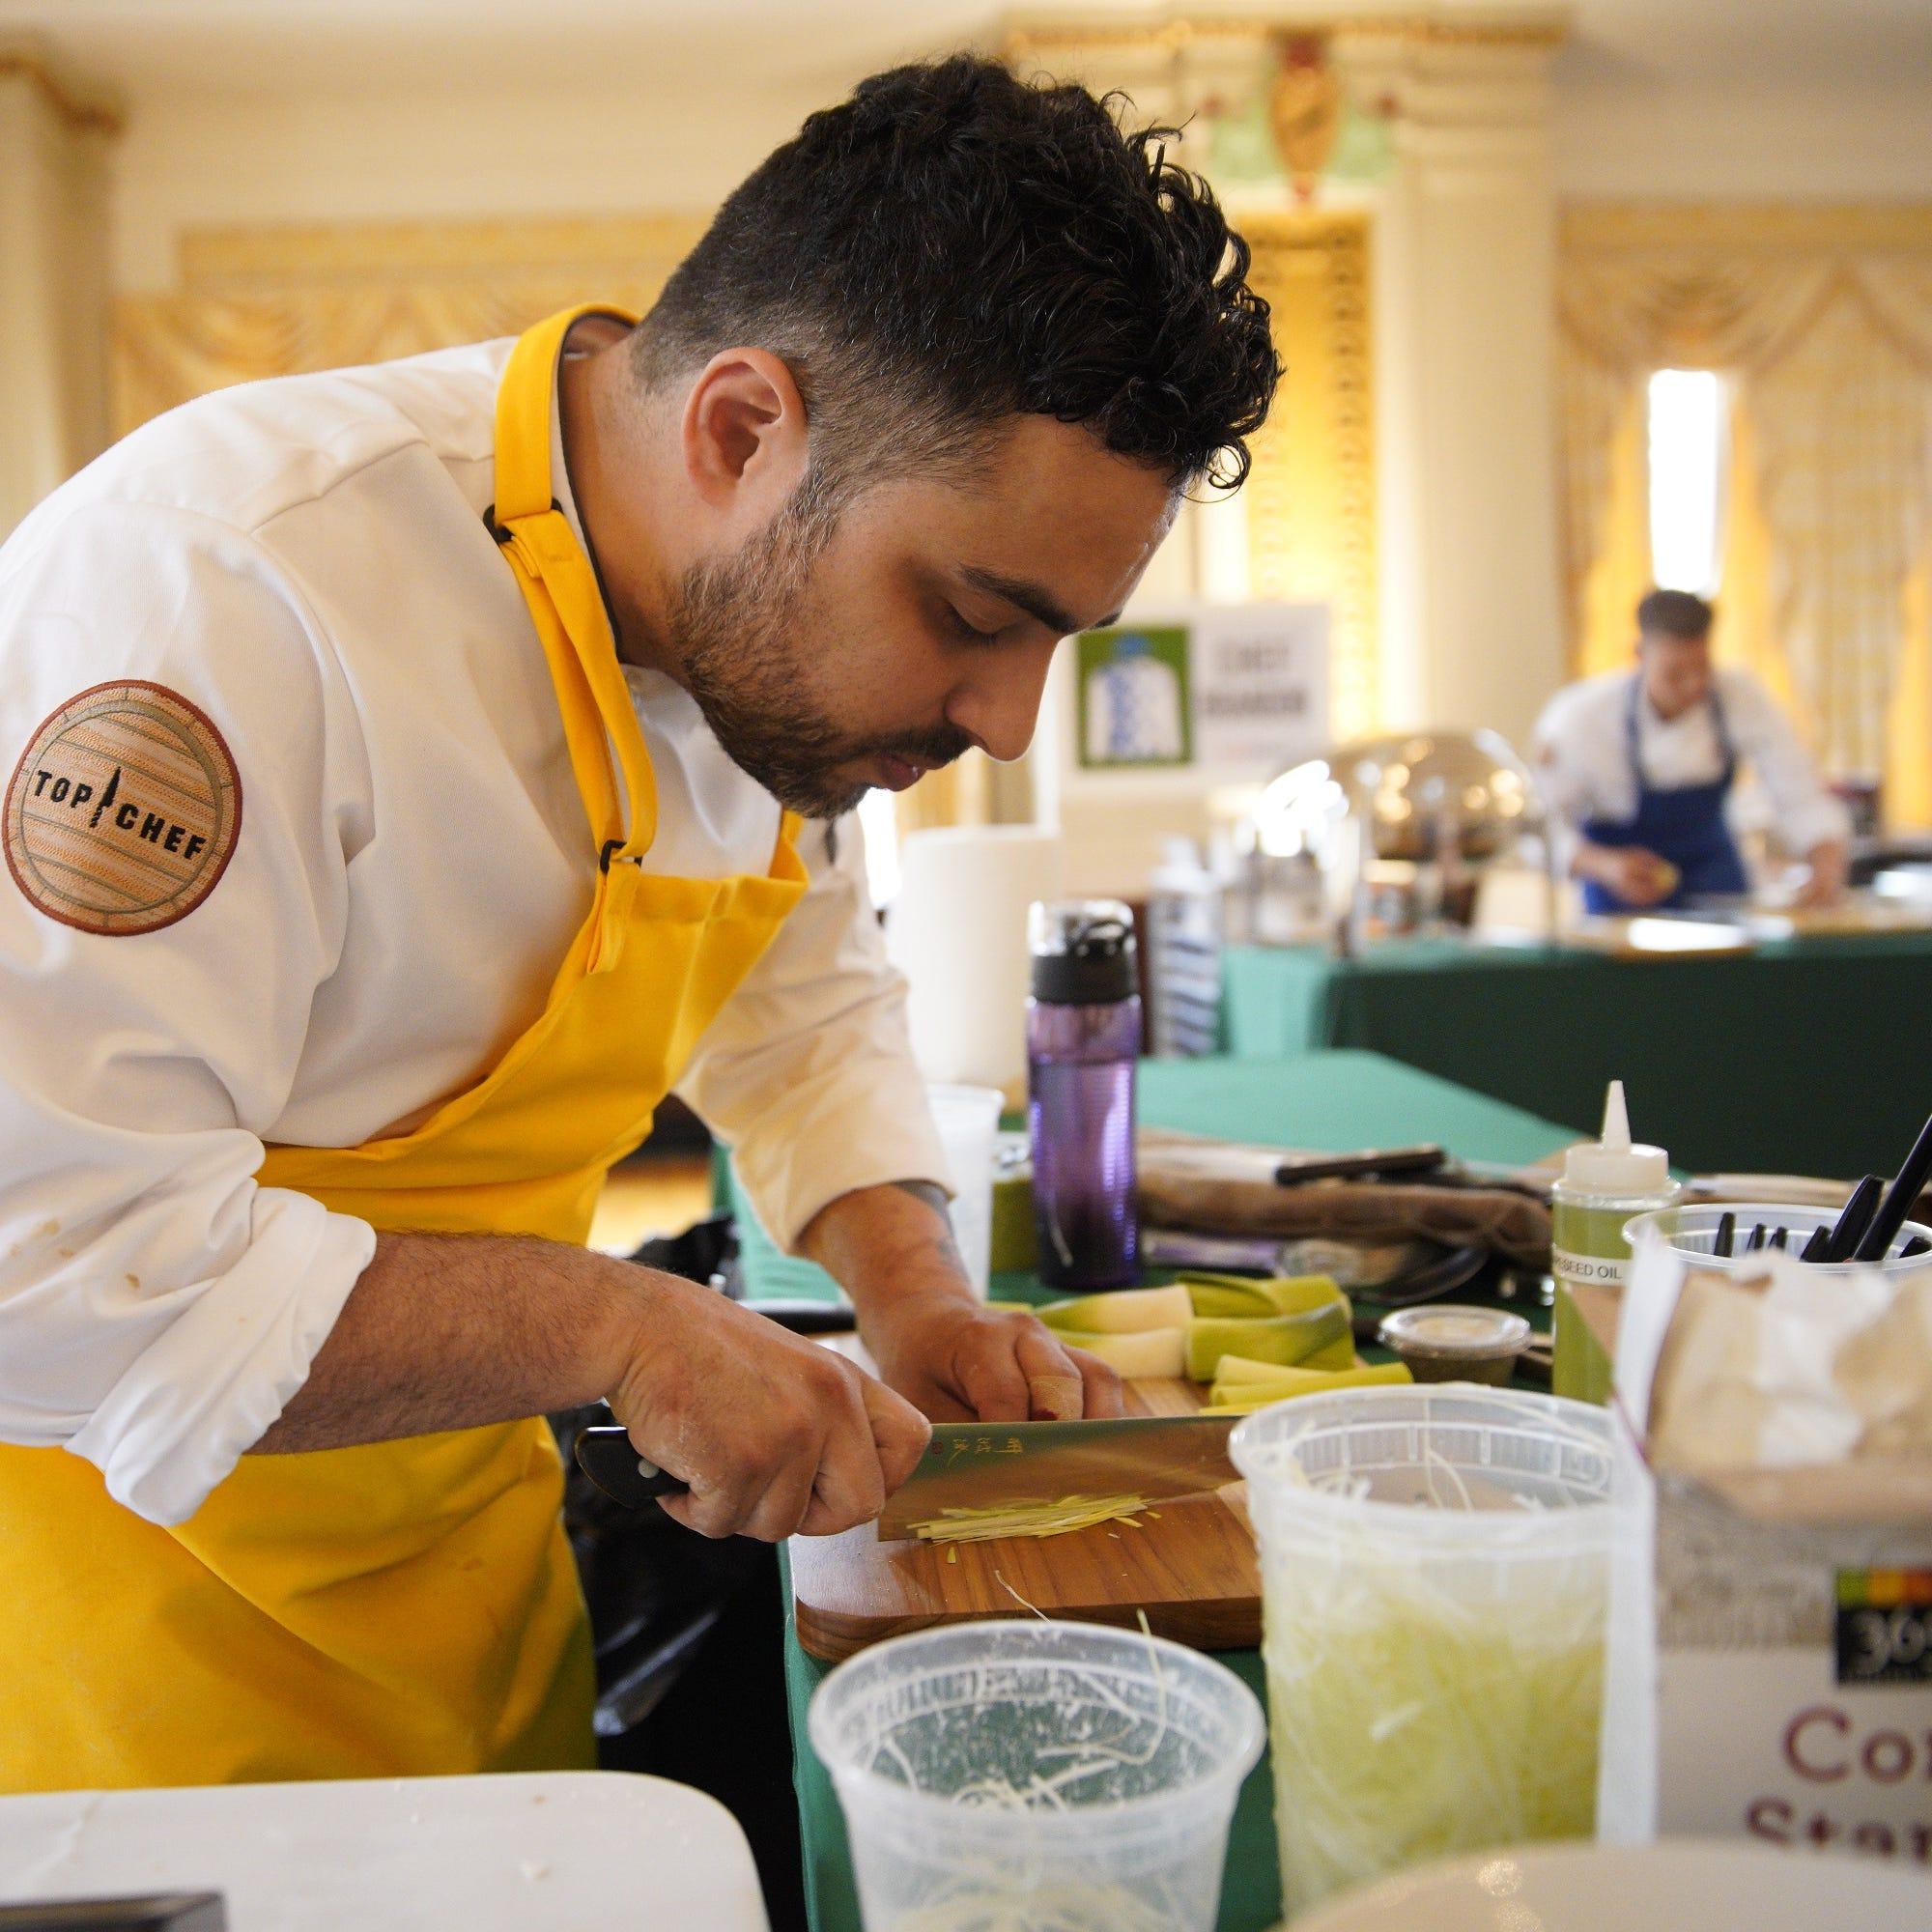 'Top Chef,' featuring Shore chef David Viana, premieres tonight